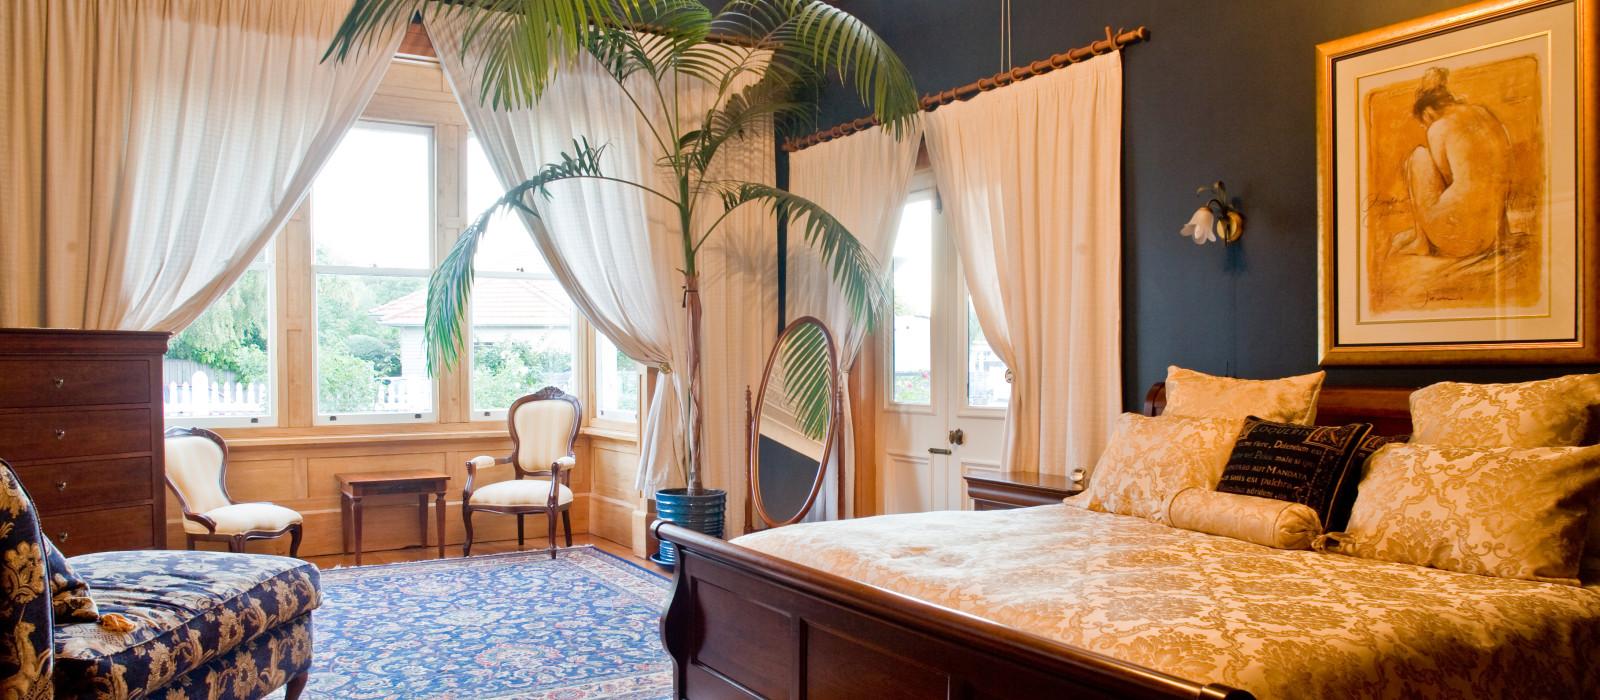 Hotel McHardy Lodge New Zealand